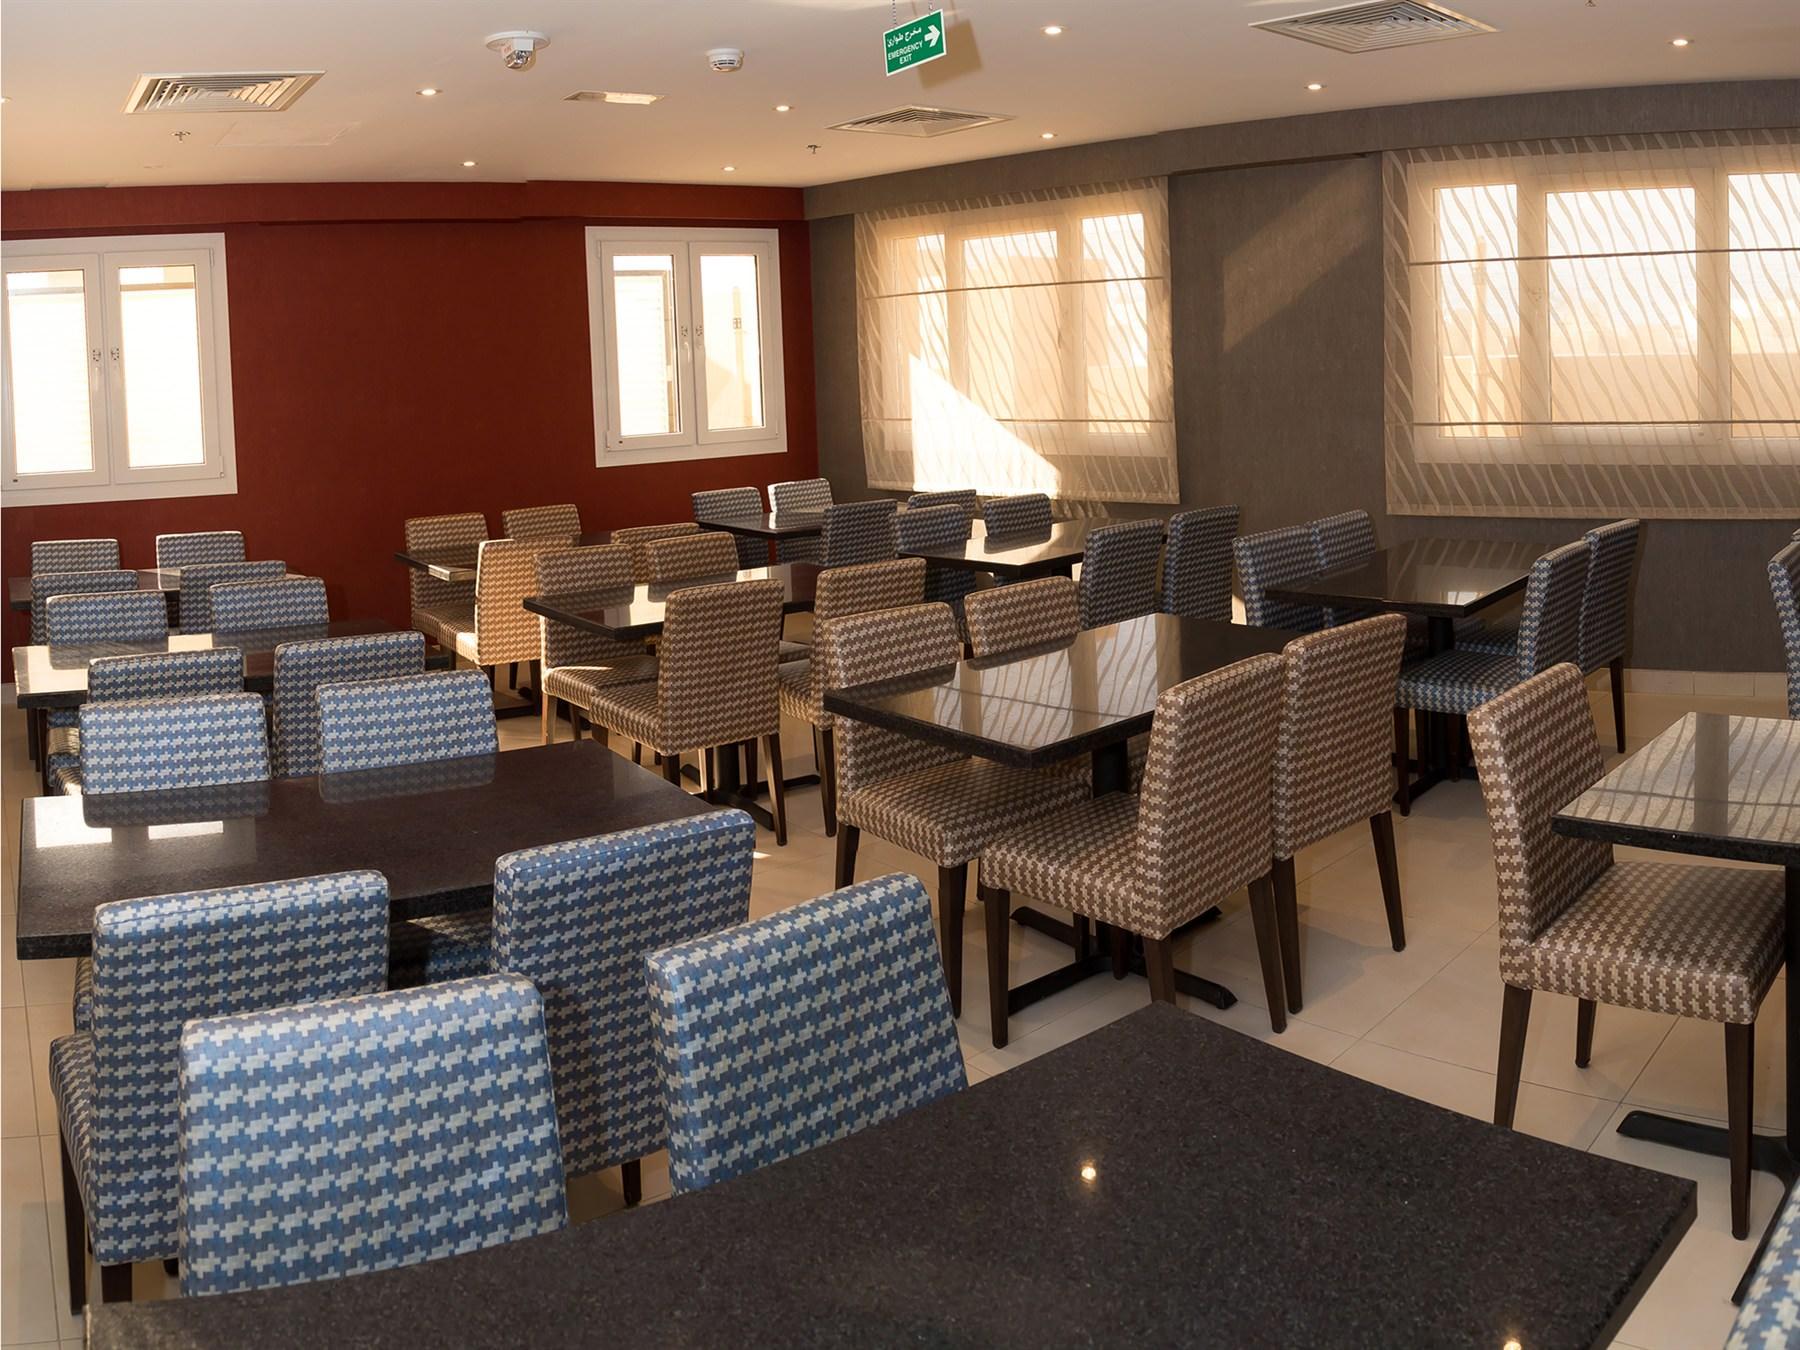 هتل تایم اسکوار دبی